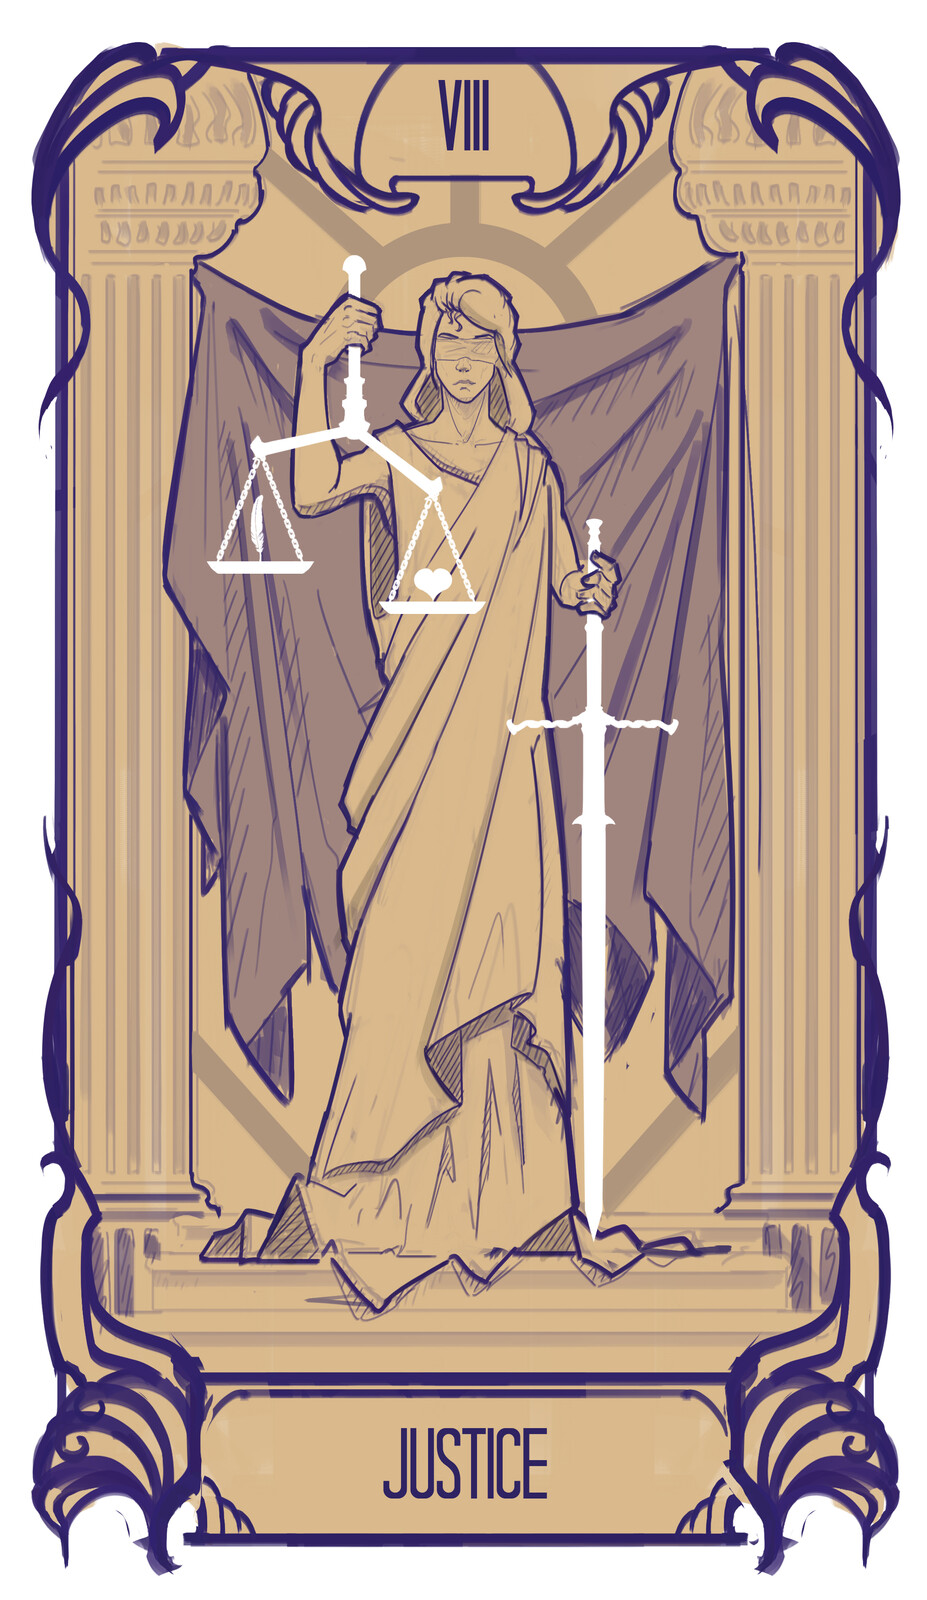 8. Justice